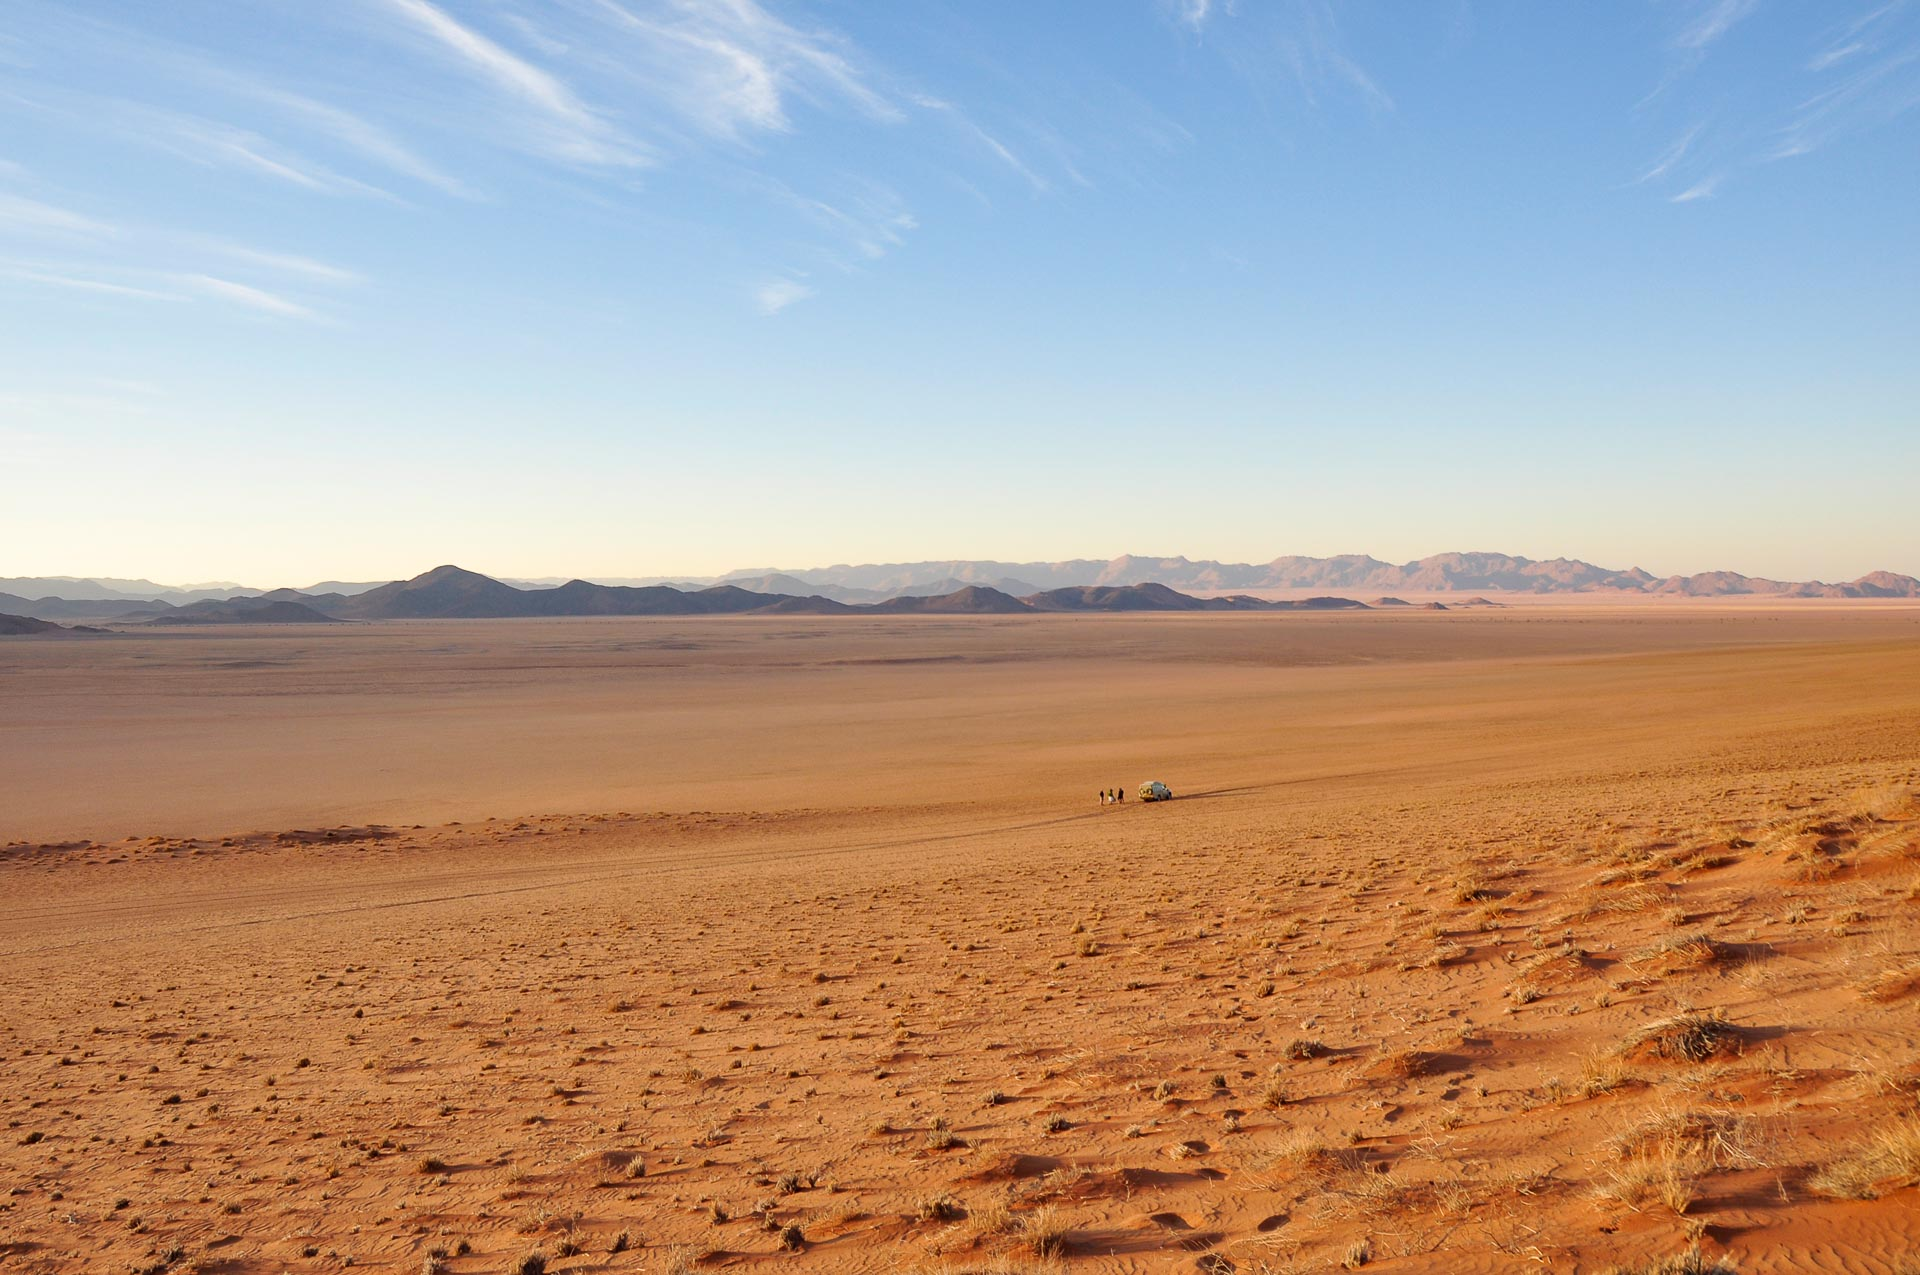 Kanaan-Desert-Retreat-Namibia-Globetrotter-Select-39